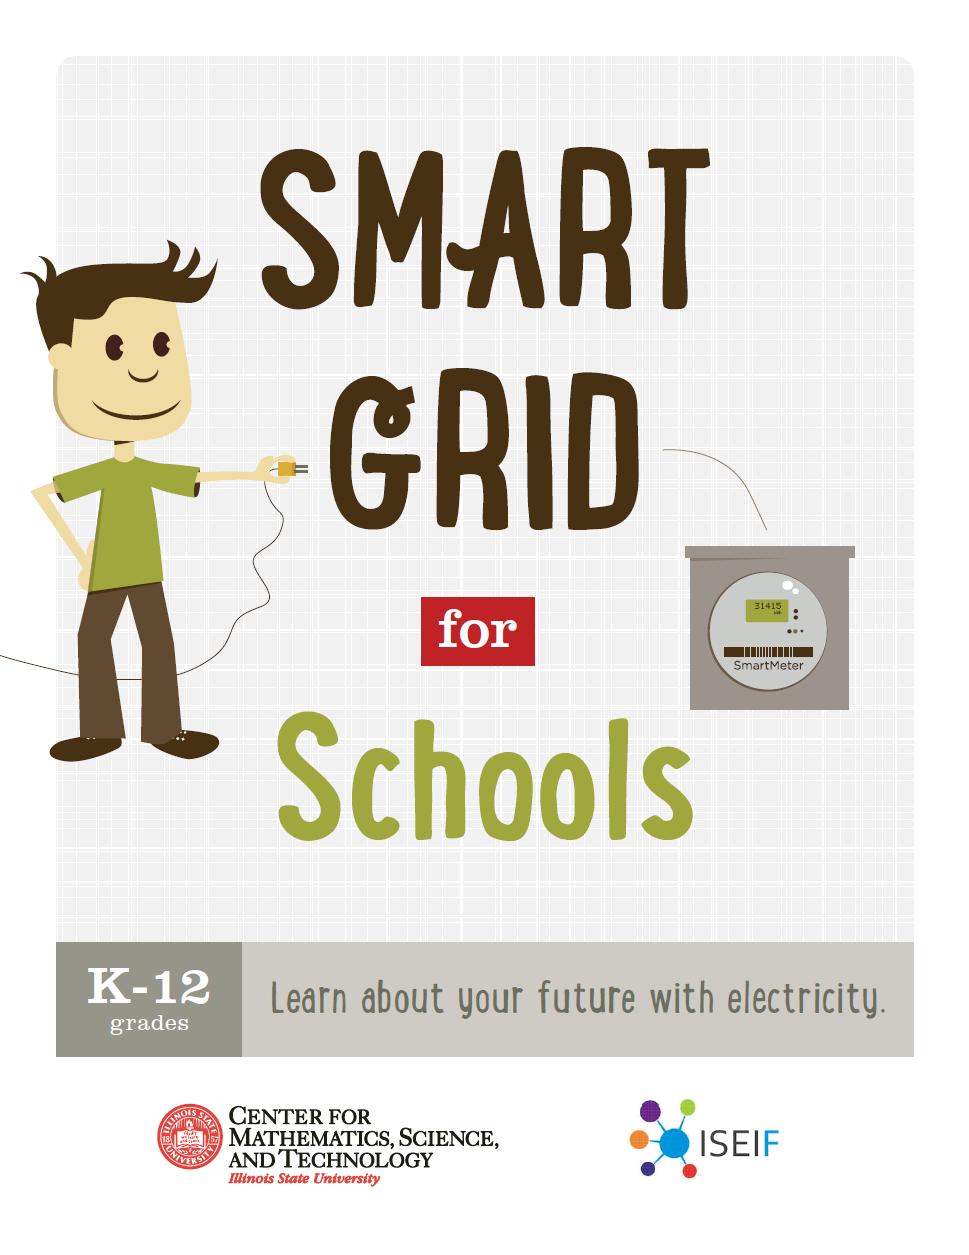 Grades clipart smart kid. Smartgridforschools org grid flyer